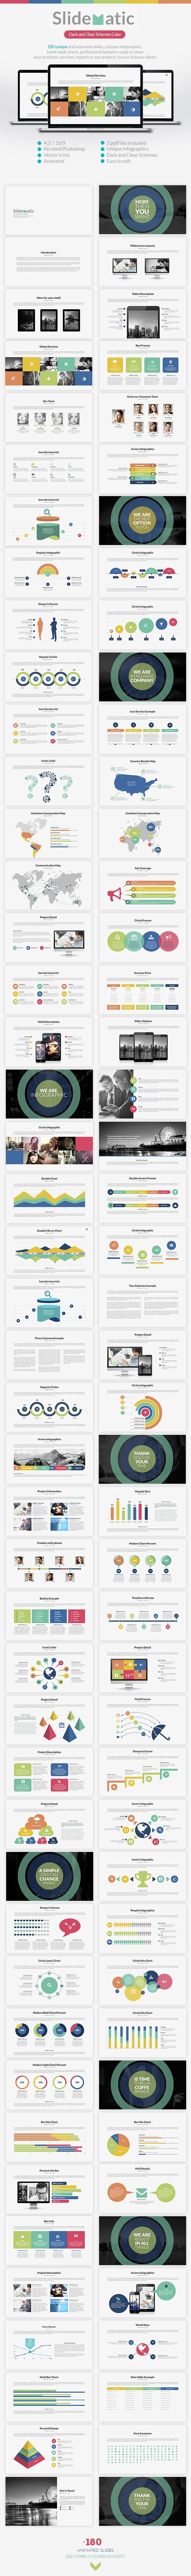 Slidematic | Powerpoint Presentation (Powerpoint Templates)